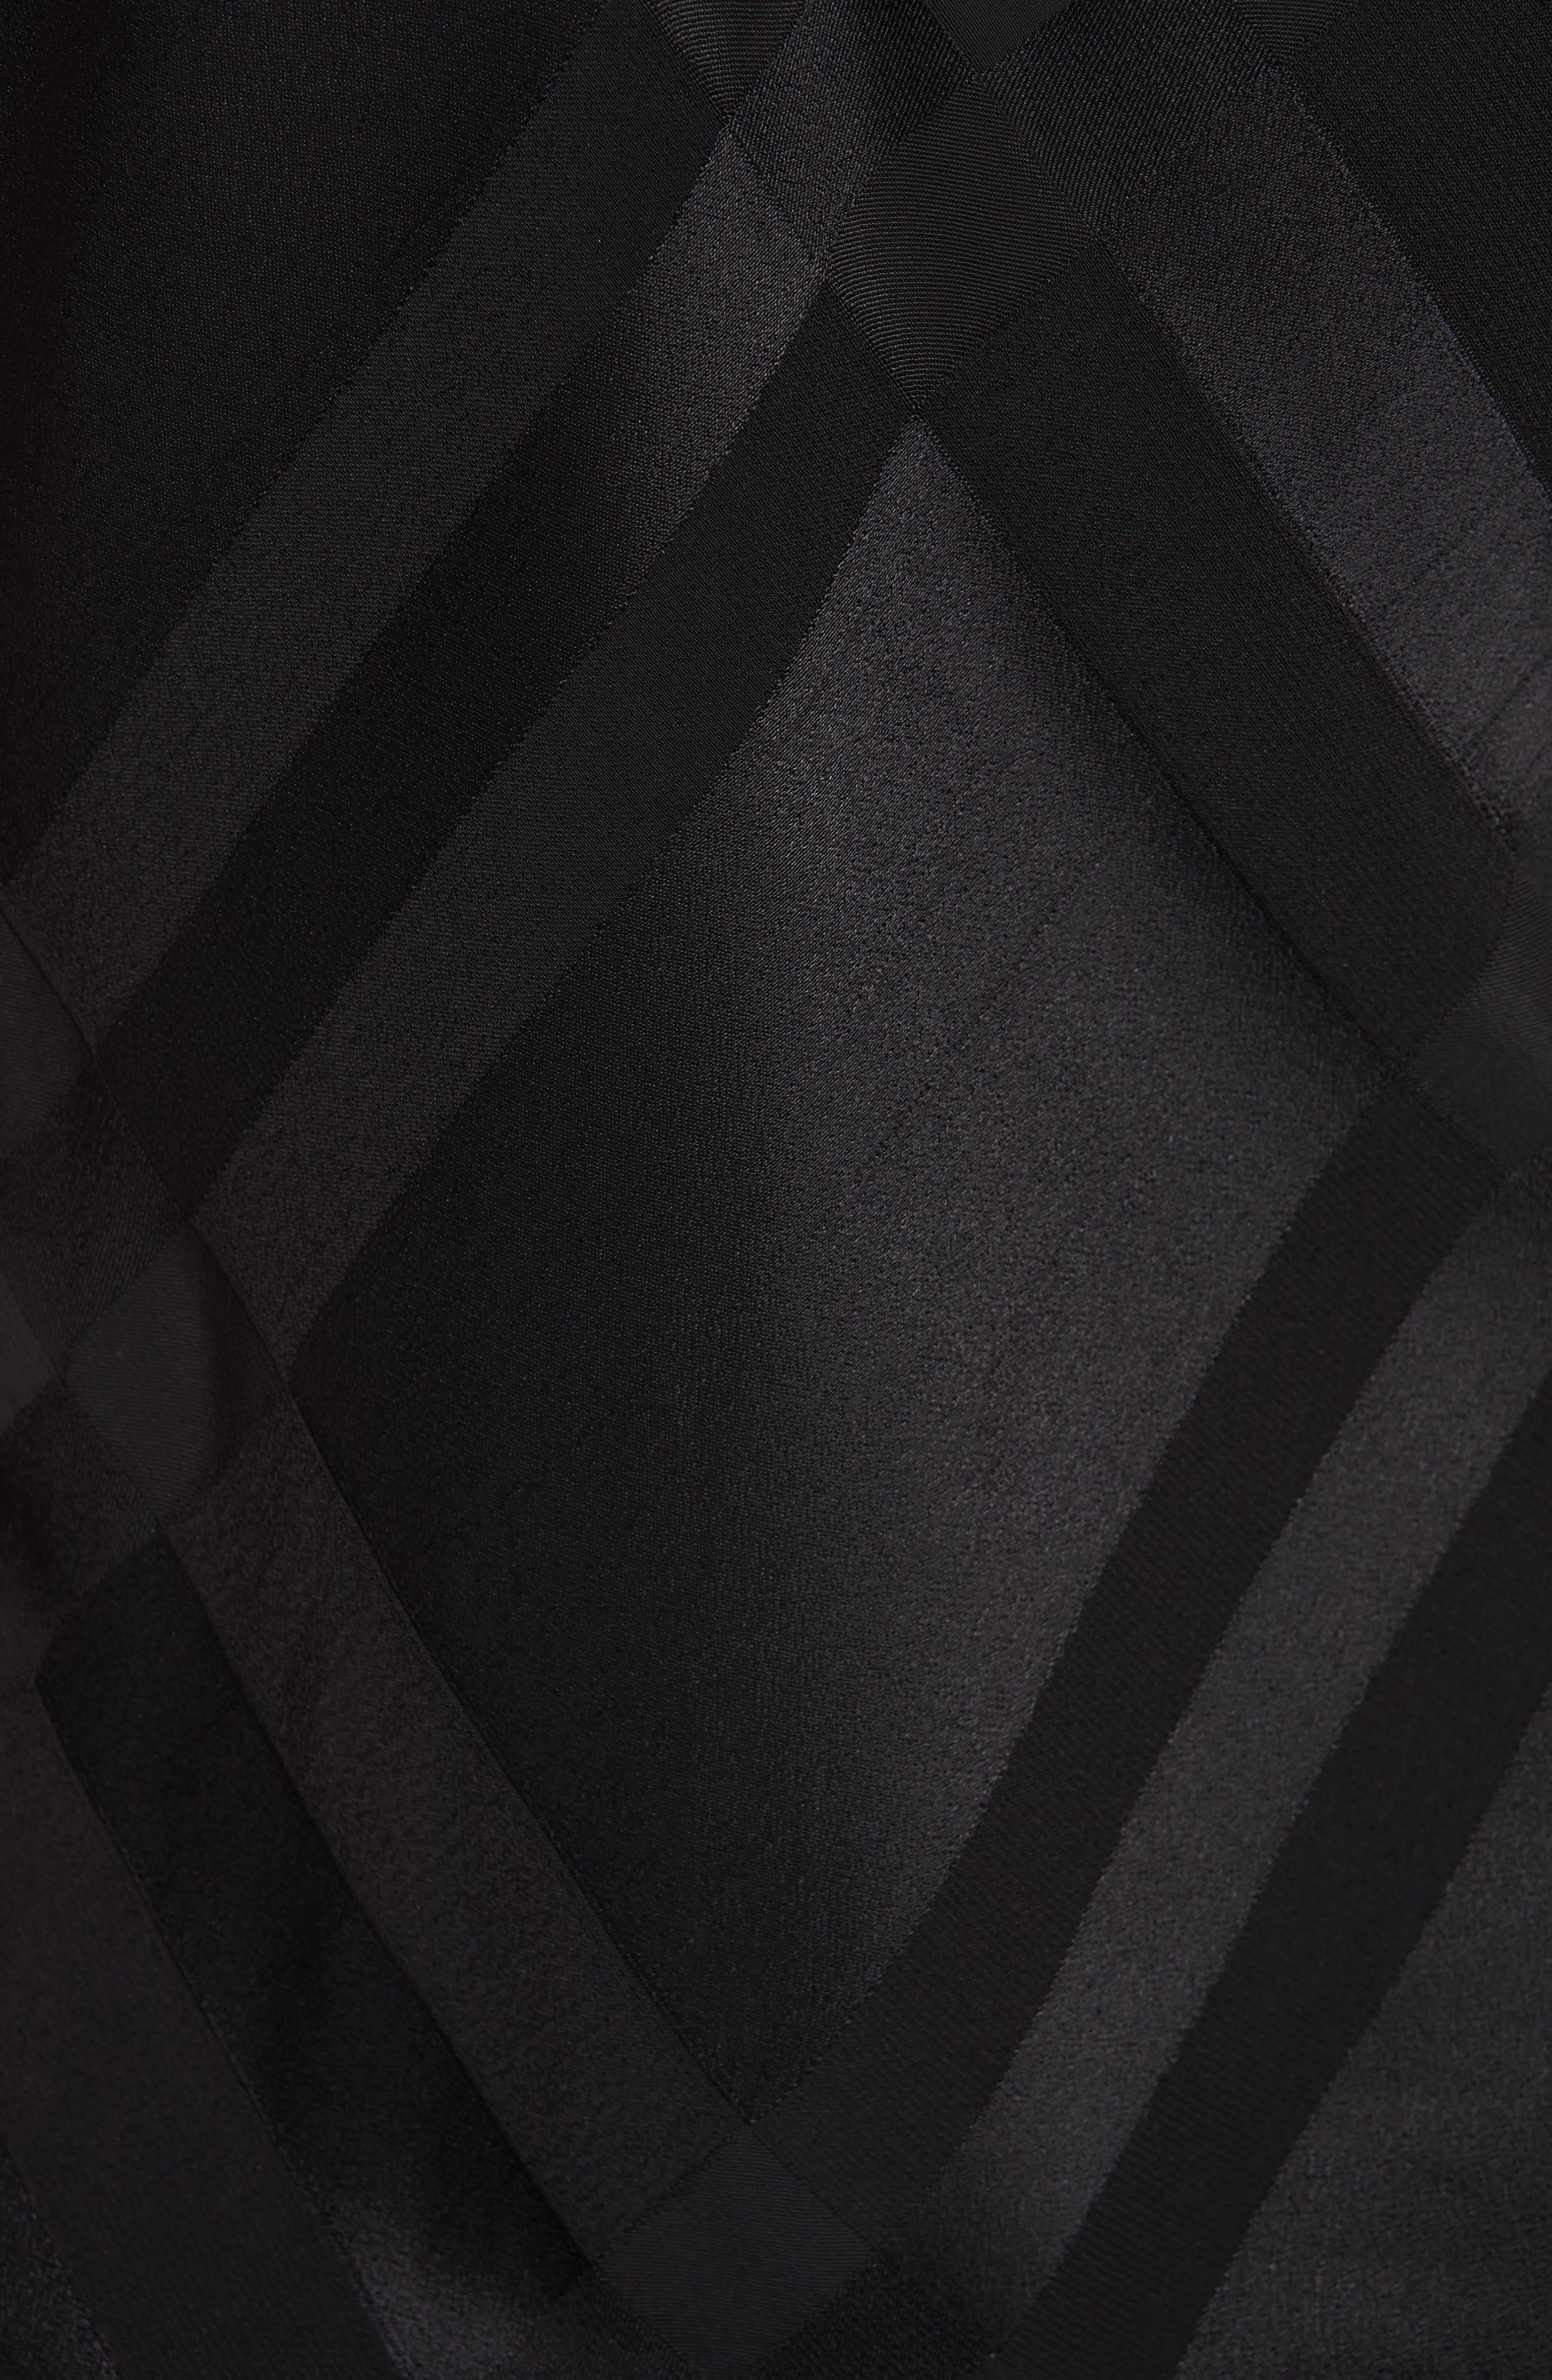 TED BAKER LONDON, Elten Mesh Trim Camisole, Alternate thumbnail 5, color, BLACK